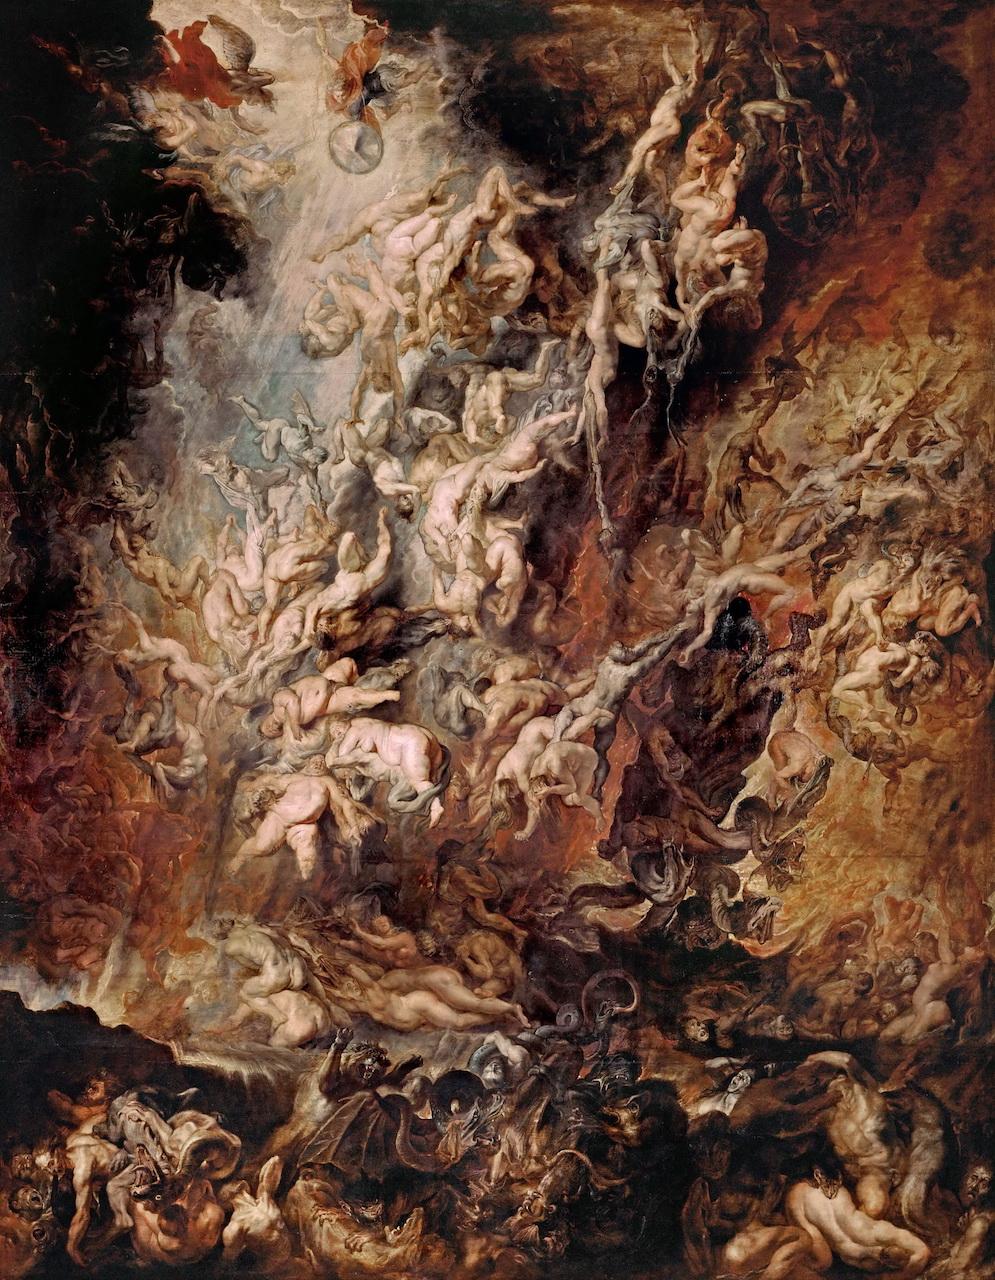 Peter Paul Rubens. Höllensturz der Verdammten. um 1620. Öl / Holz. 288 x 255cm